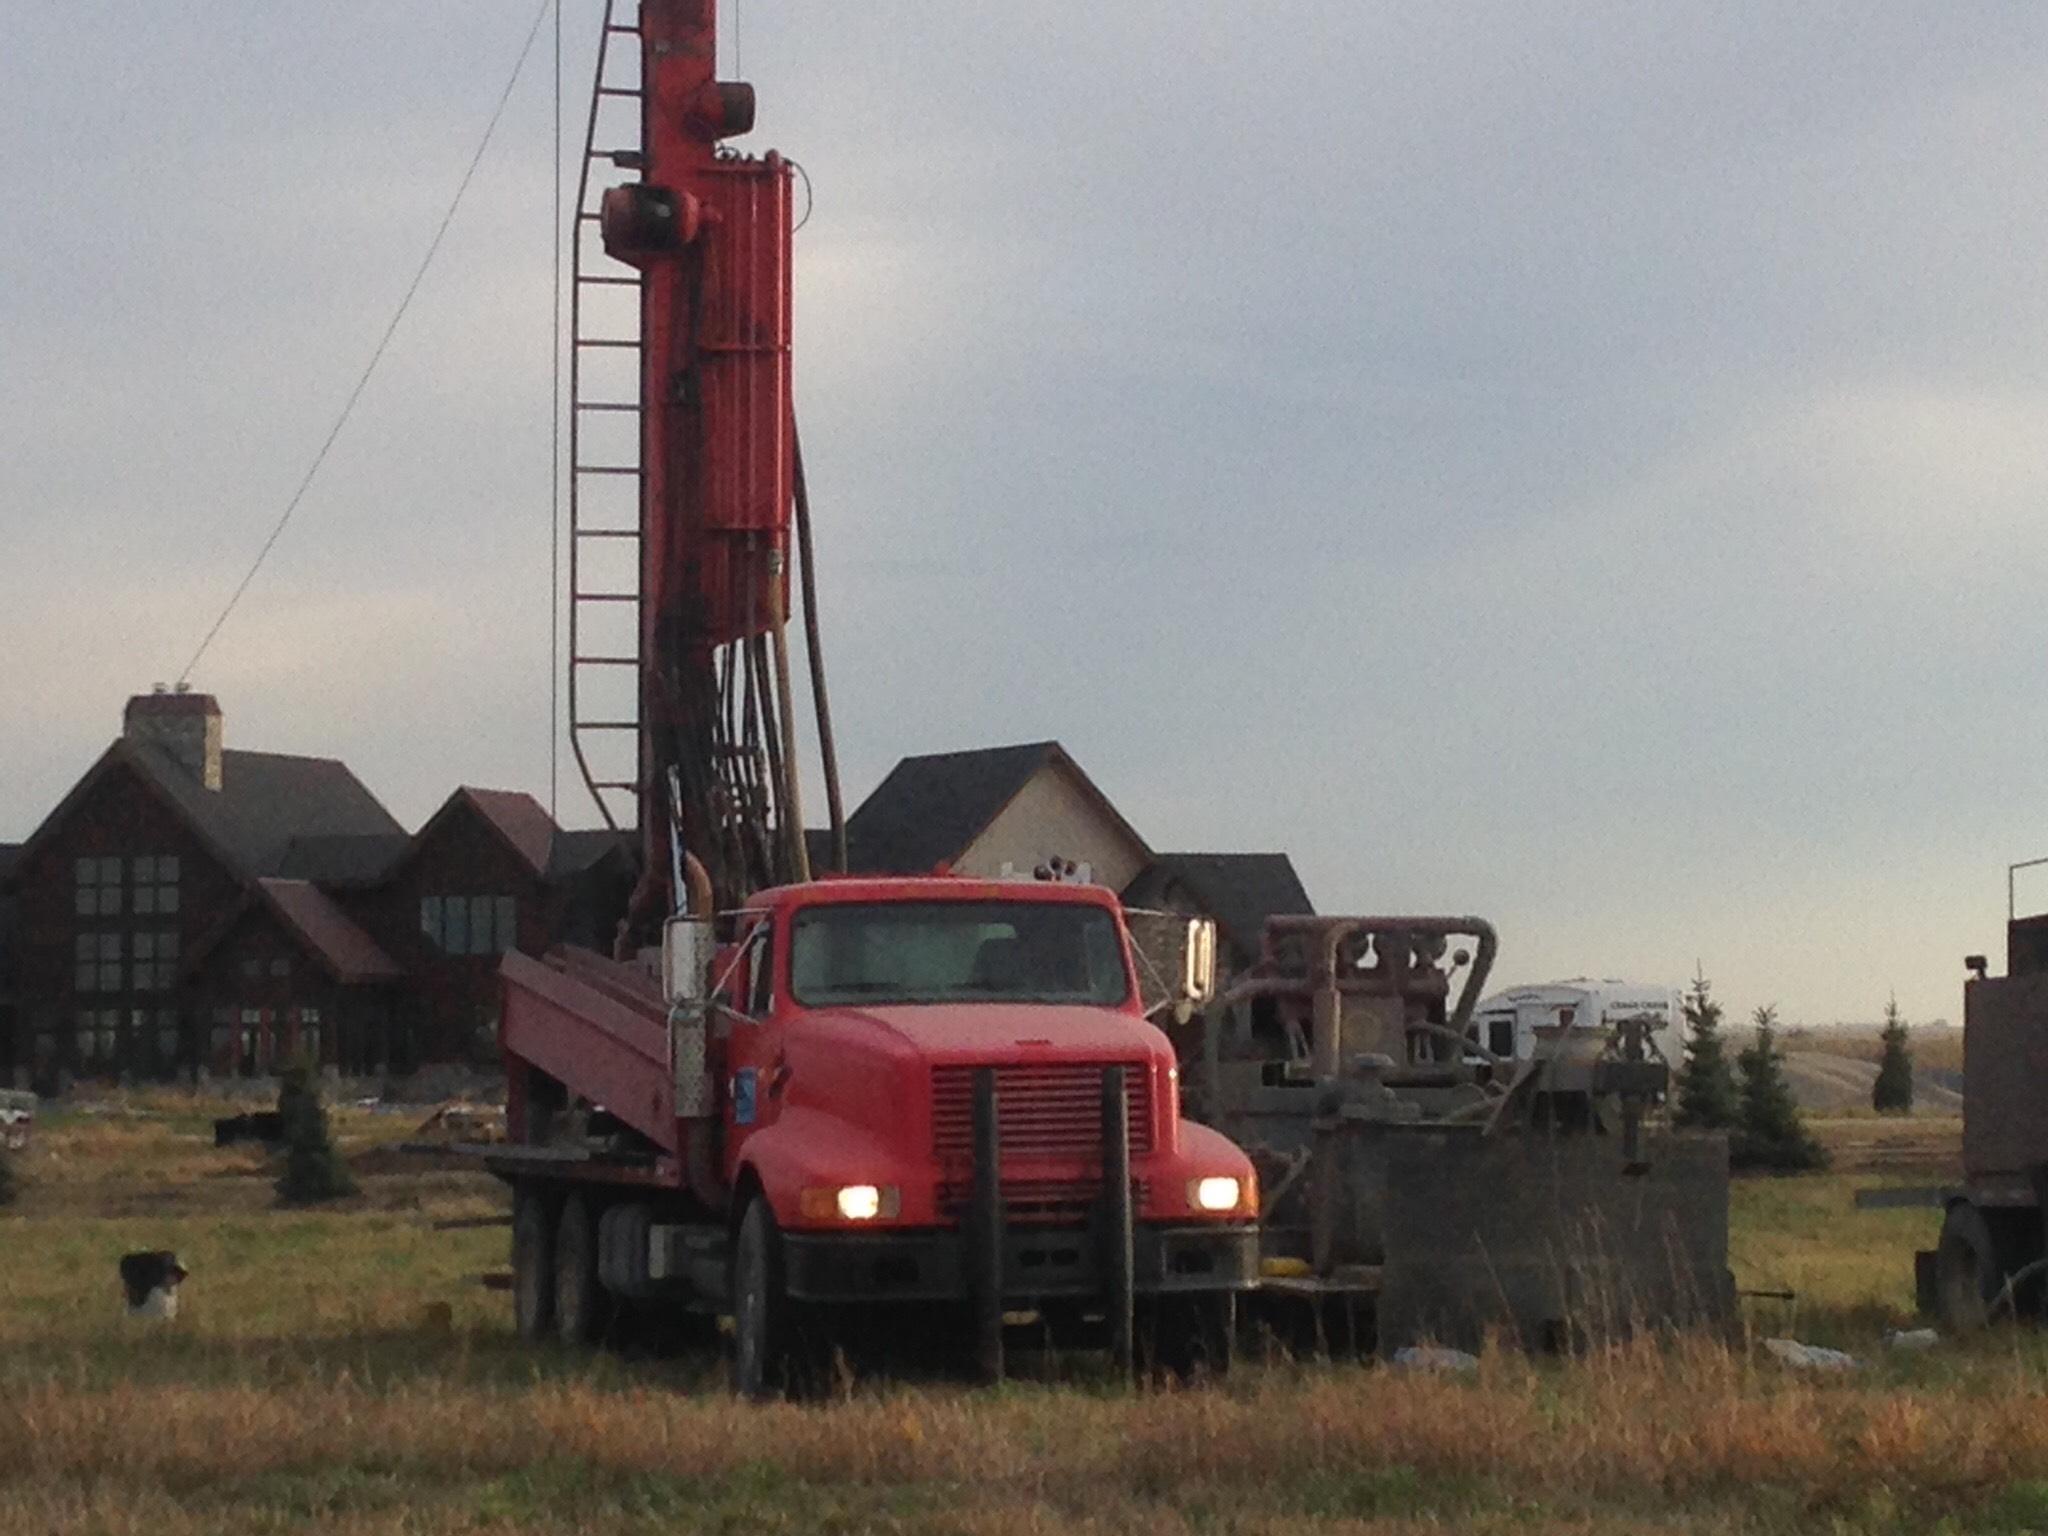 Water Welling Drilling Saskatchewan | Water Well Drillers Saskatchewan |Water Well Drillers Saskatoon | Water Well Drillers Regina | Water Well Drilling Cost Saskatchewan